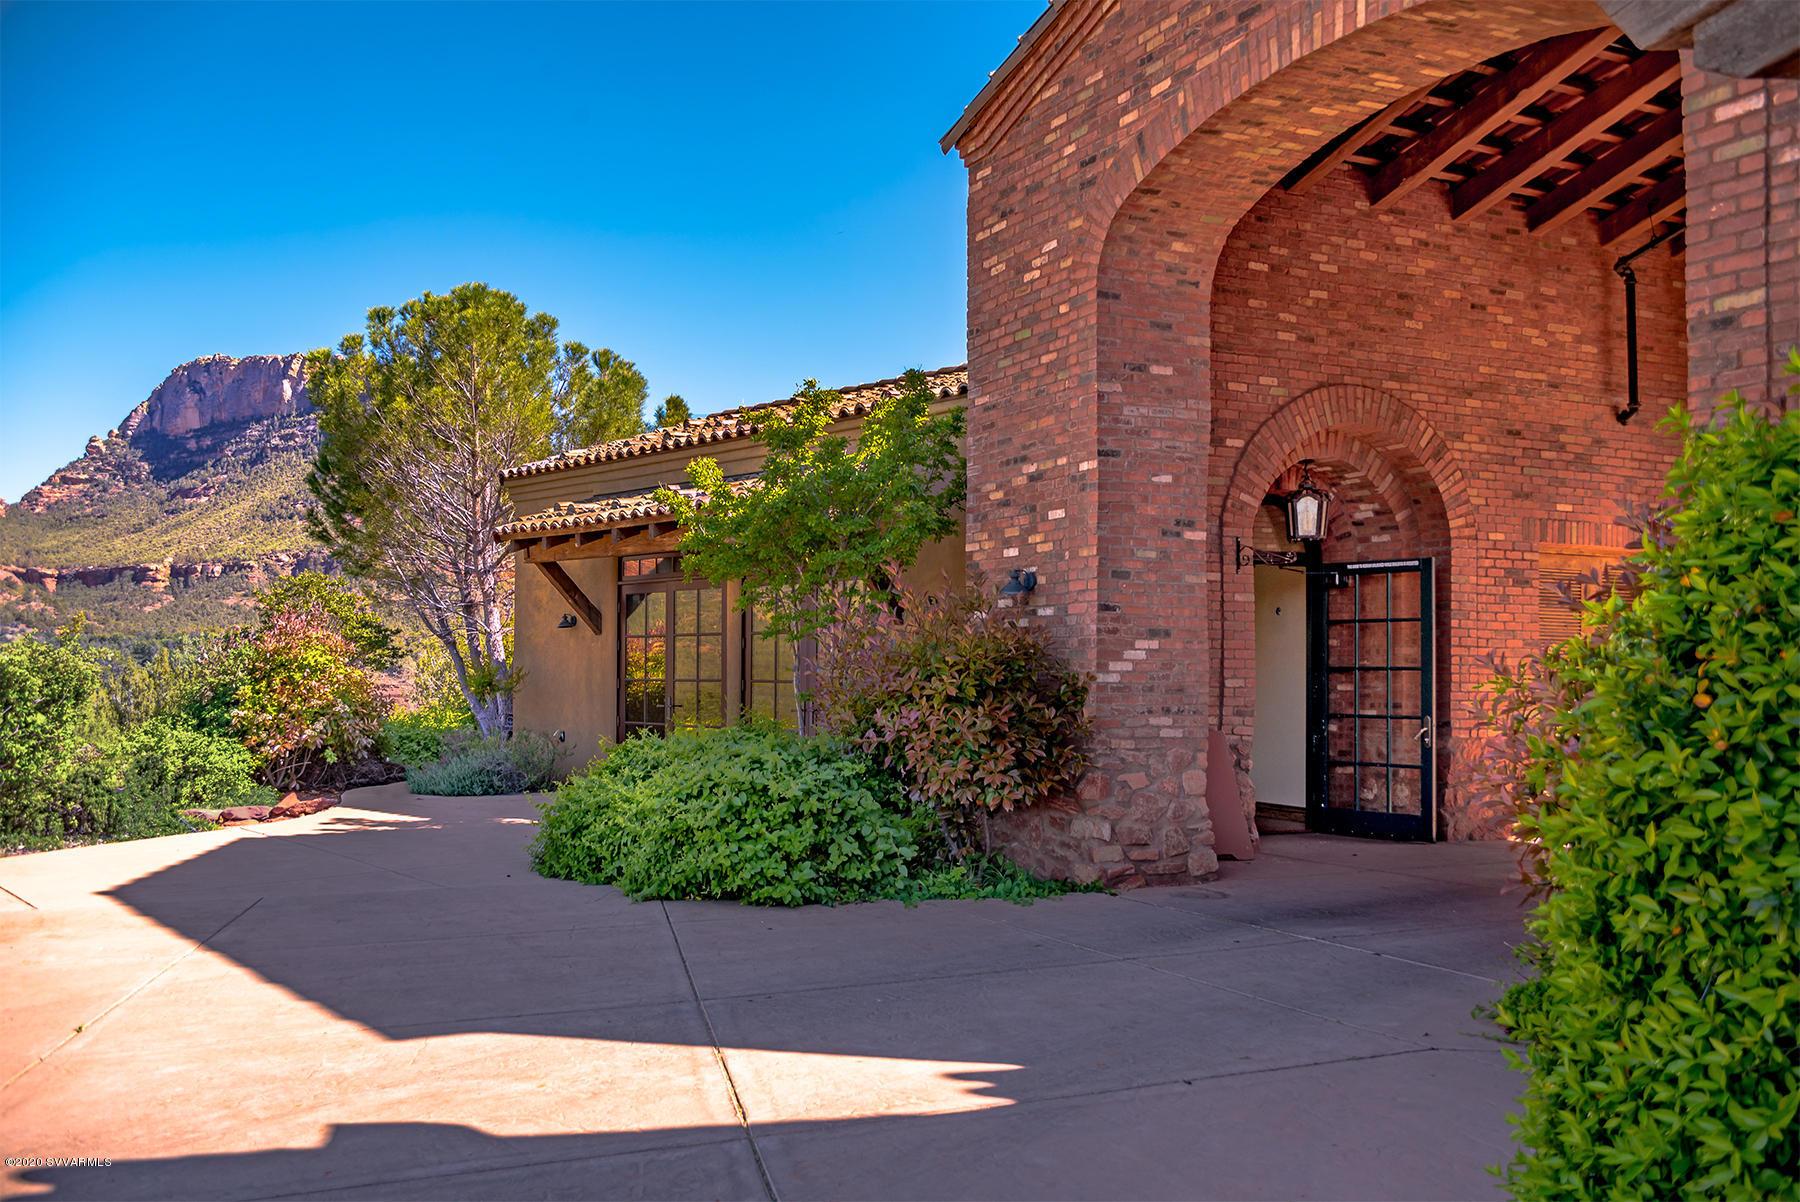 Photo of 50 Canyon Vista Rd, Sedona, AZ 86336